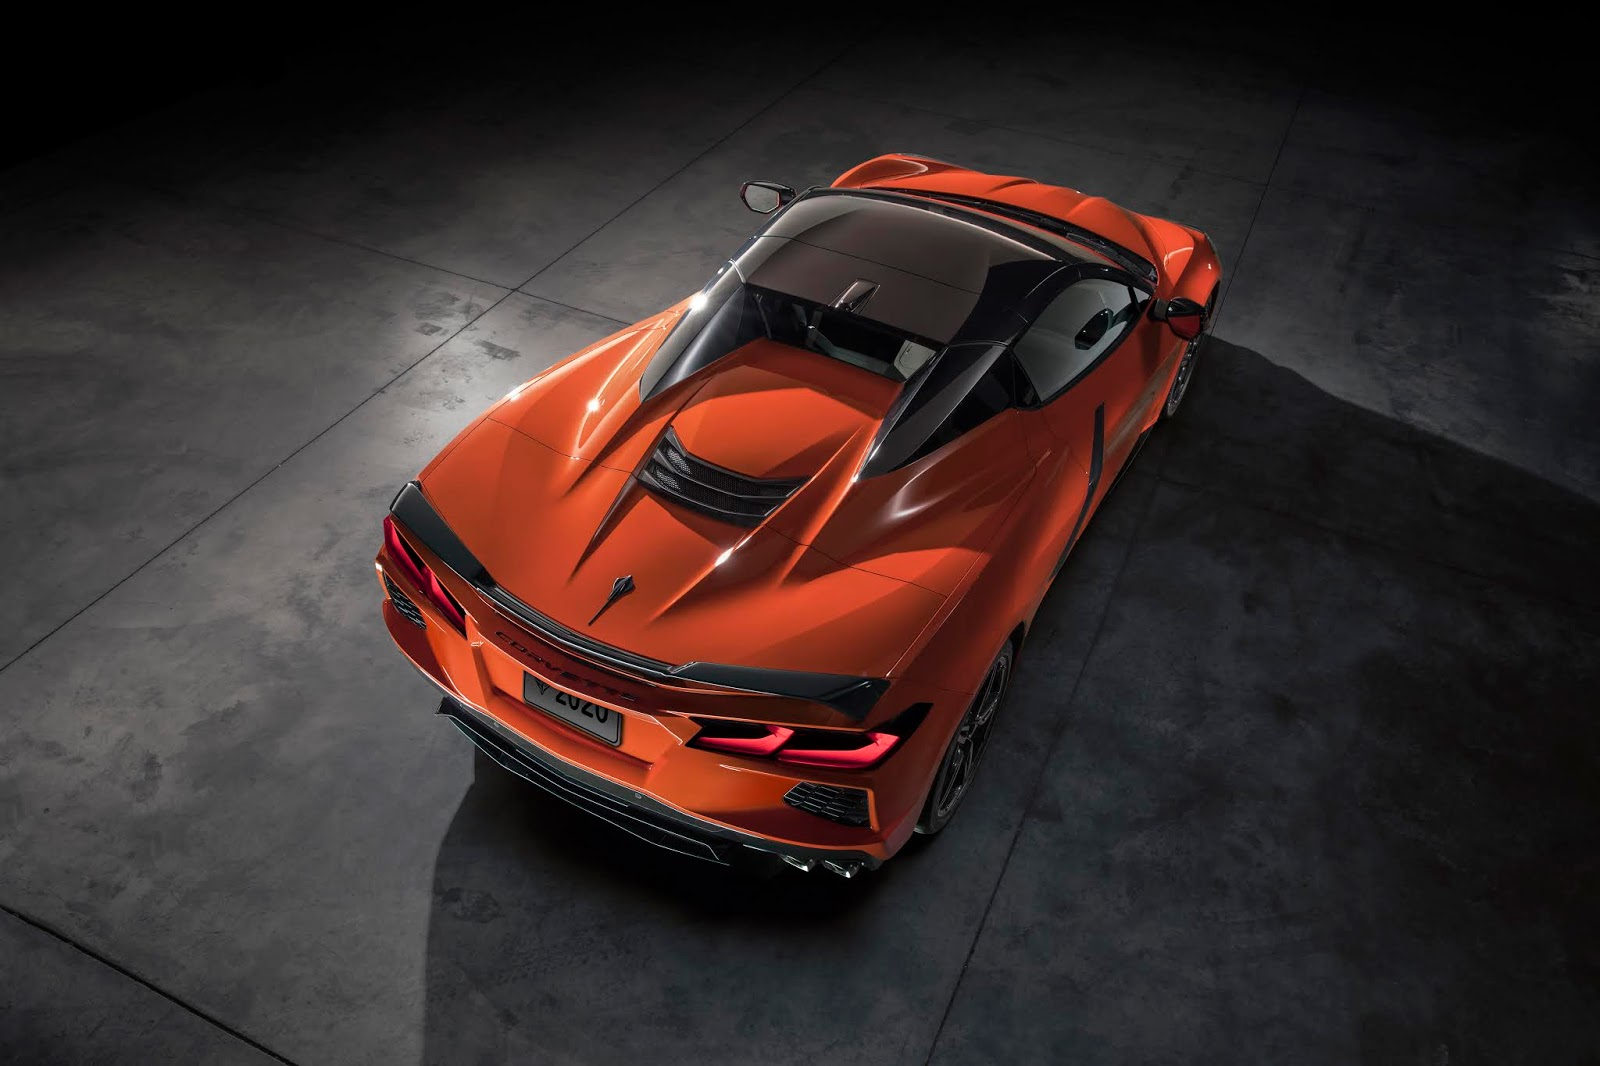 2020 Chevrolet Corvette Stingray Convertible 004 Γιατί η C8 Convertible είναι η καλύτερη Corvette ever C8, Chevrolet, Chevrolet Corvette, Corvette, zblog, ειδήσεις, καινούργιο, καινούρια, καινούριο